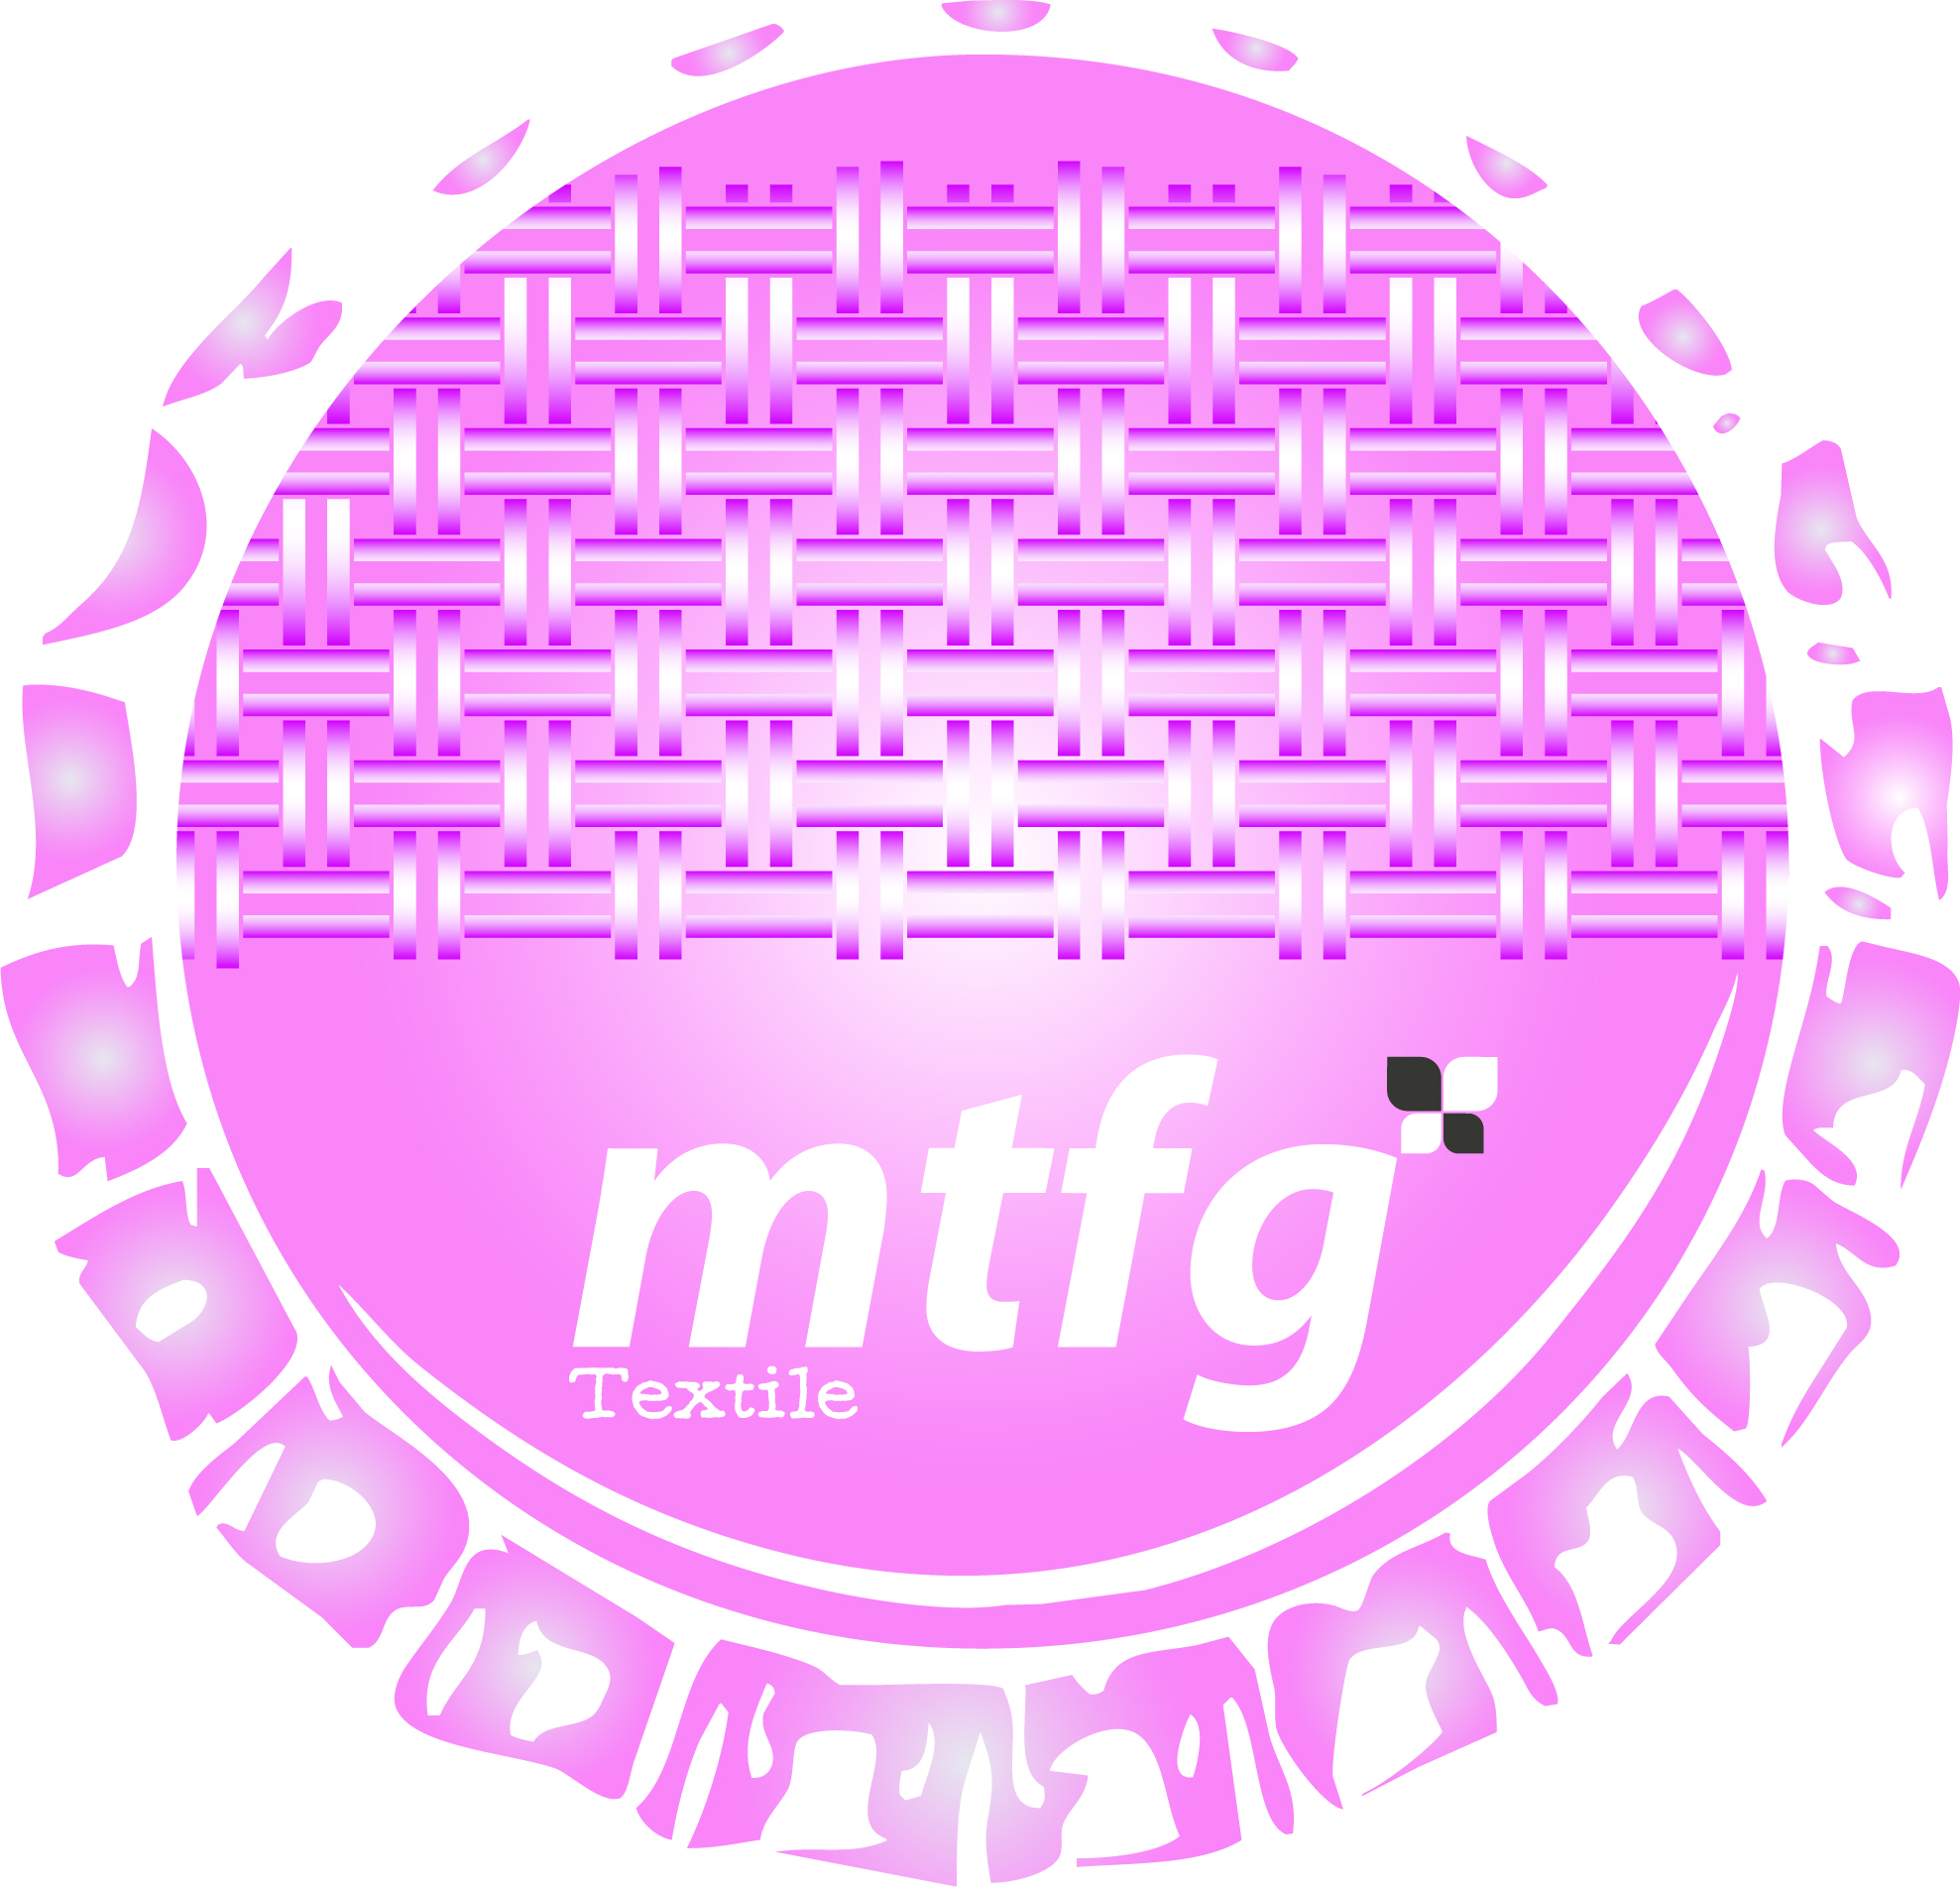 MTFG Textile